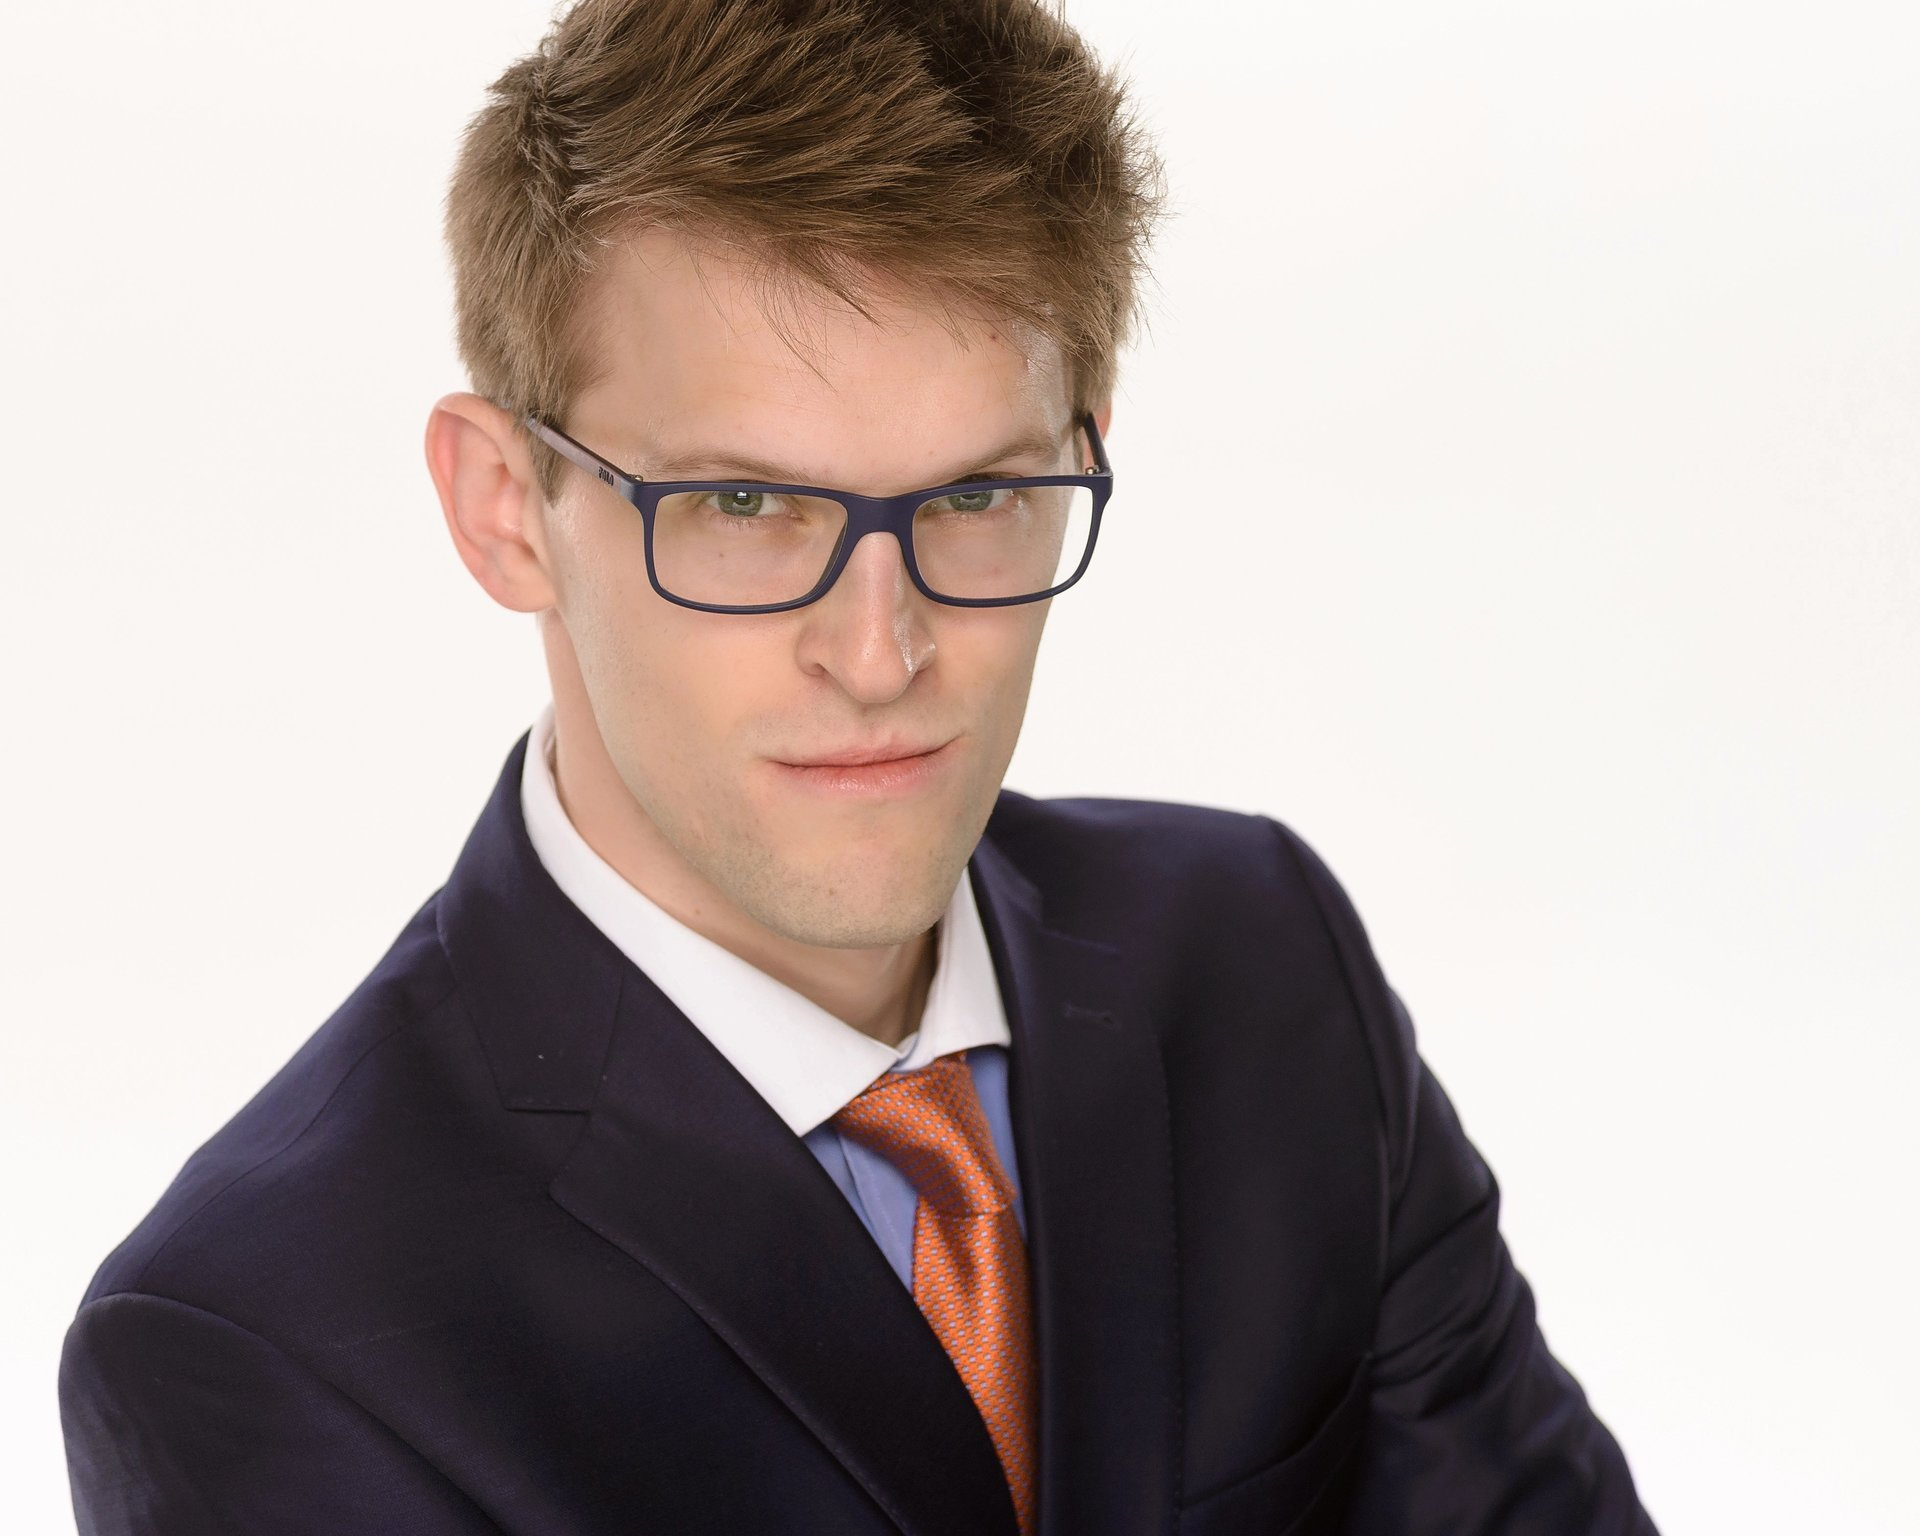 Erik J. Krueger